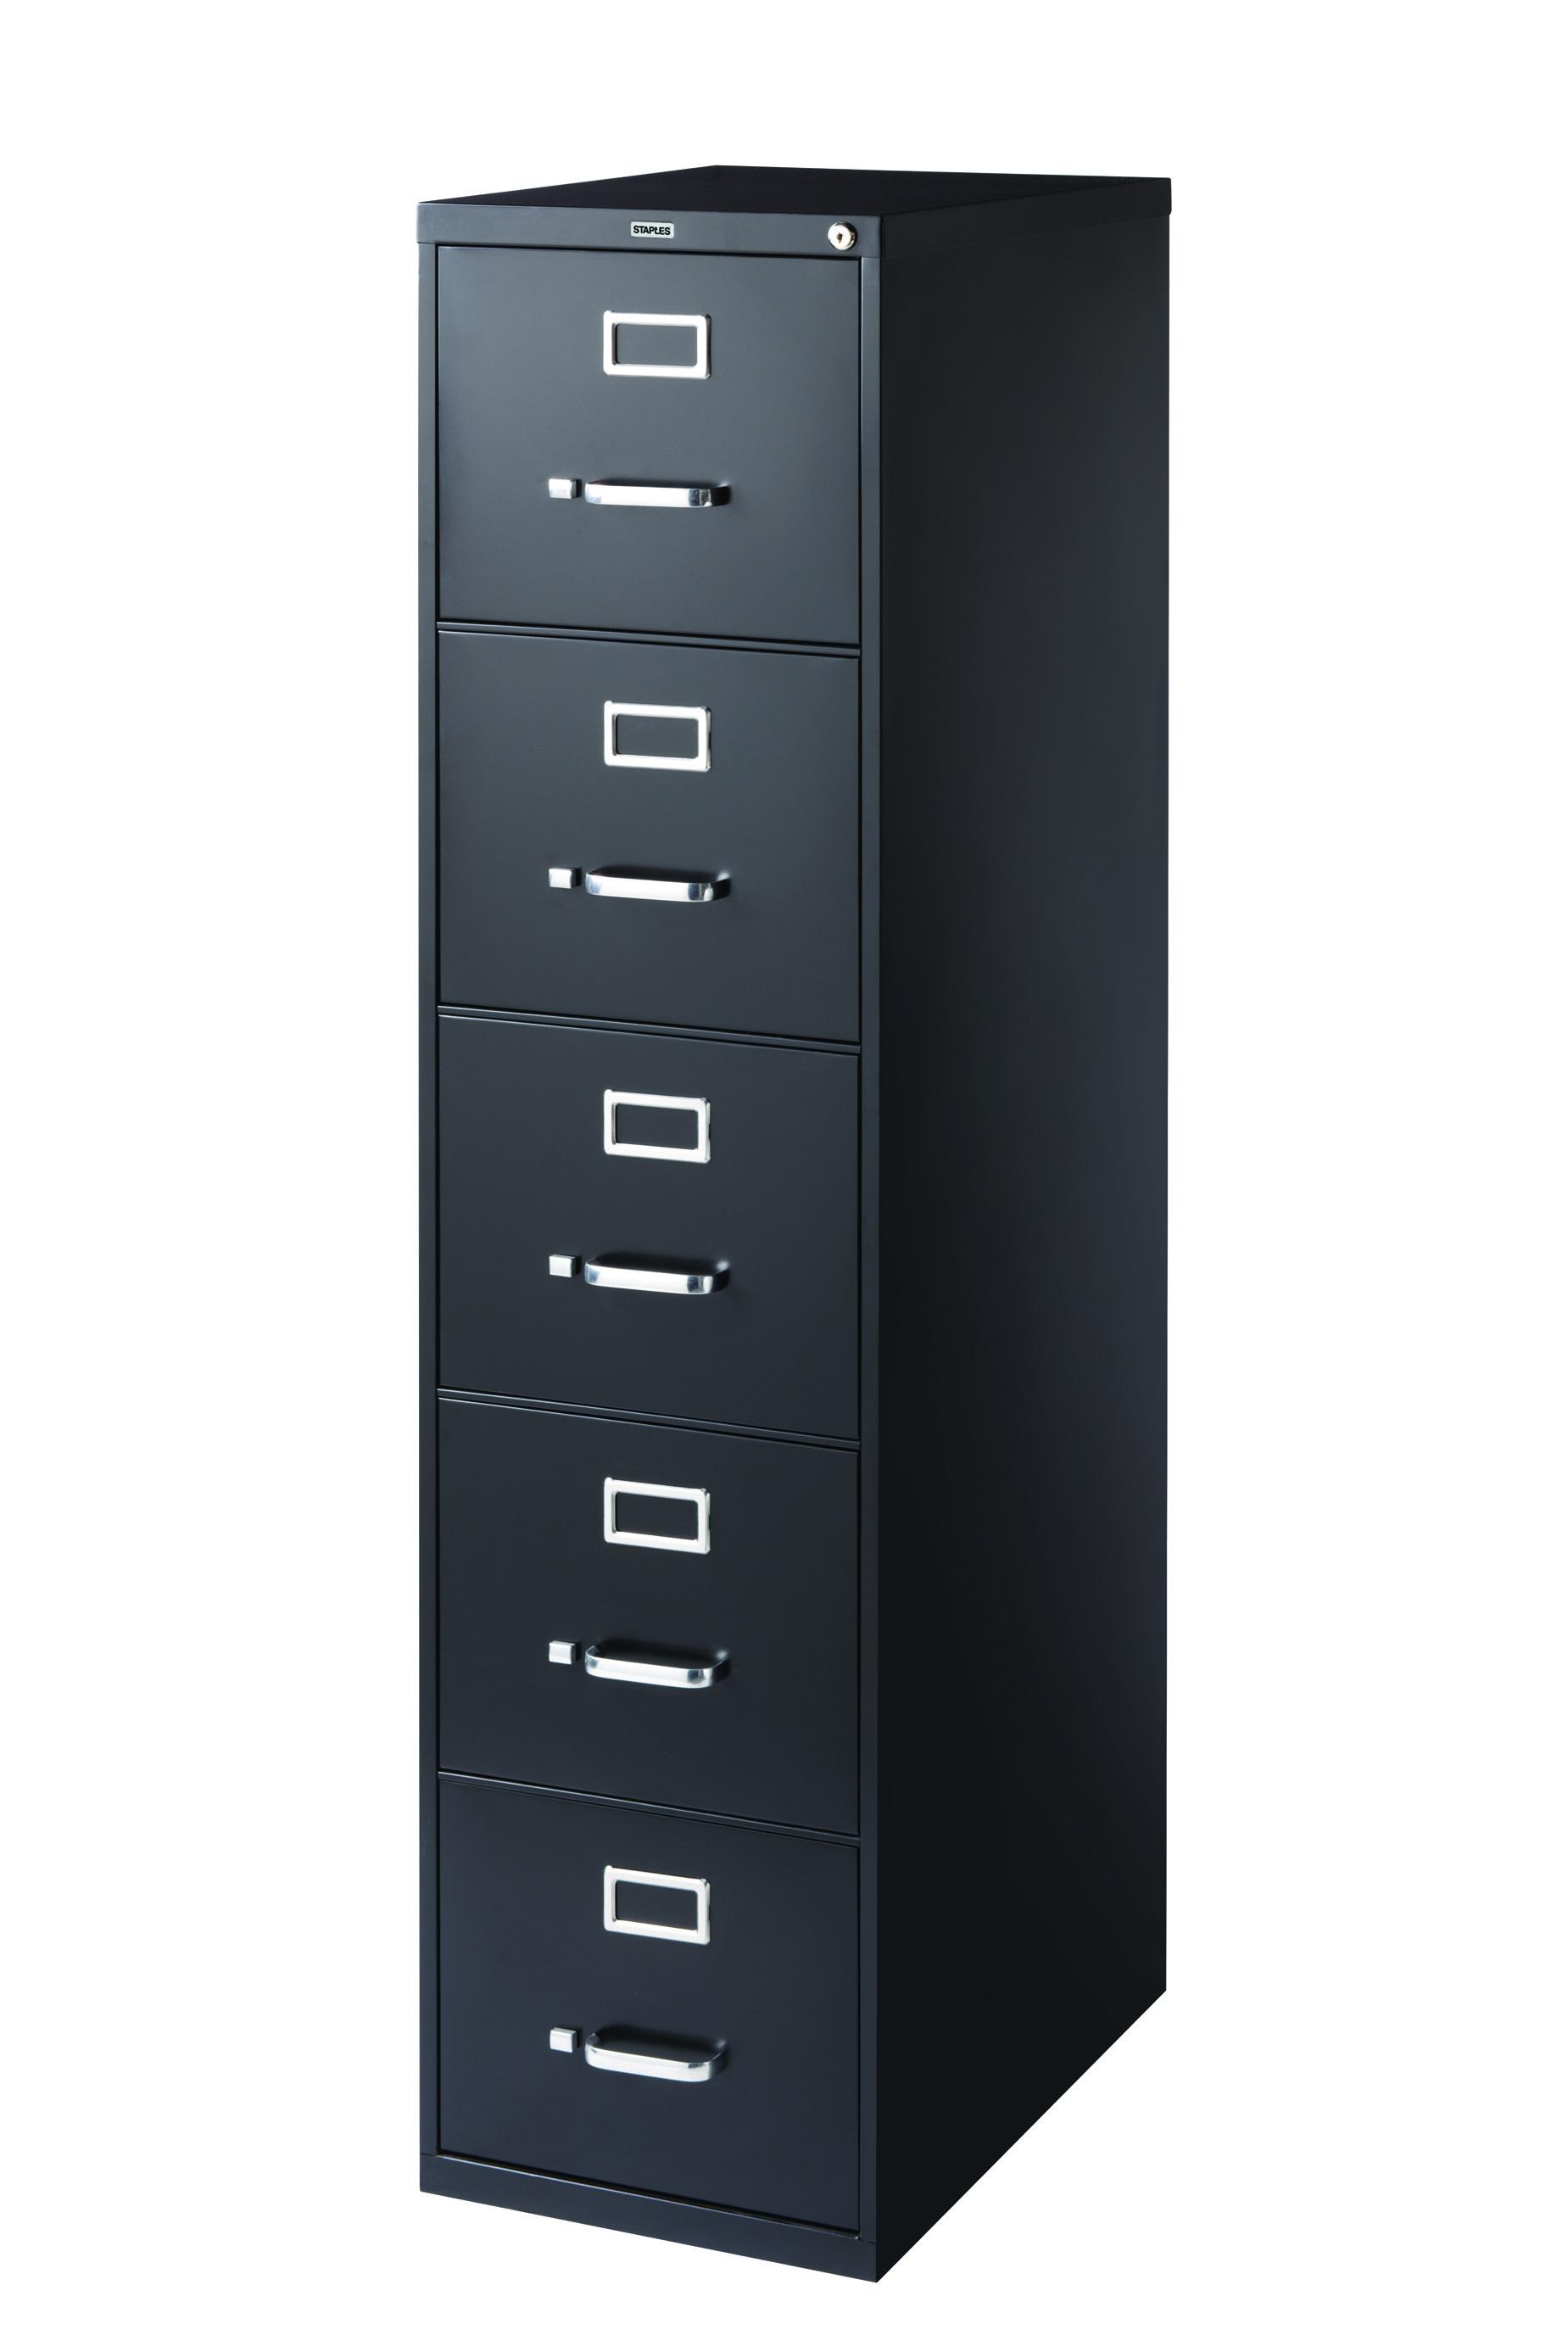 Staples 5 Drawer Letter Size Vertical File Cabinet Black